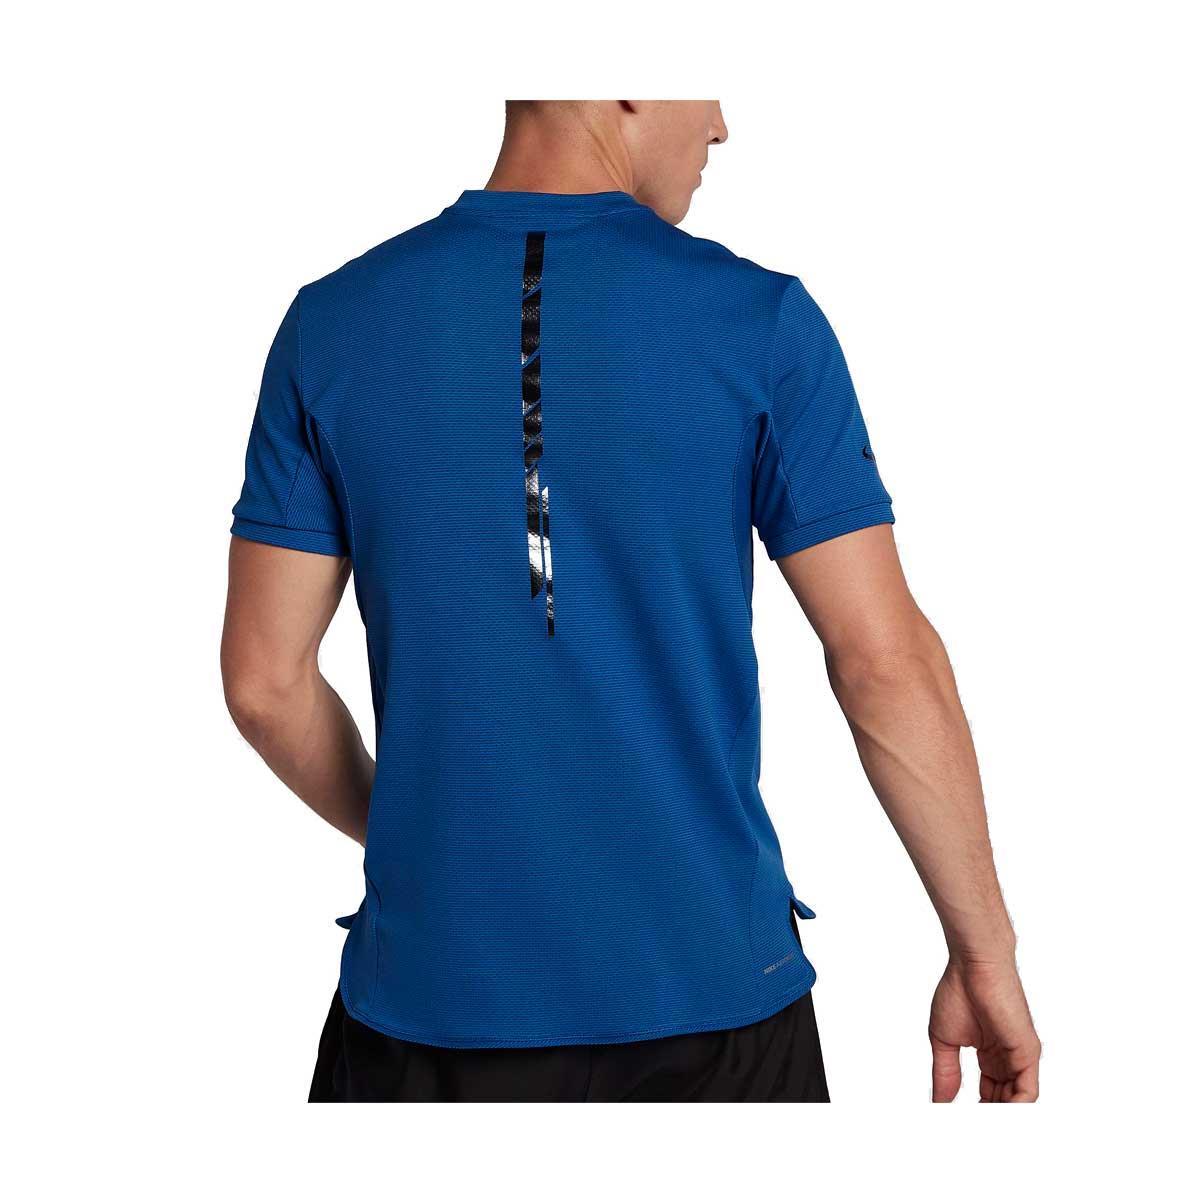 a054061fb9a62 Camiseta Nike Rafael Nadal Aeroreact Challenger Masculino